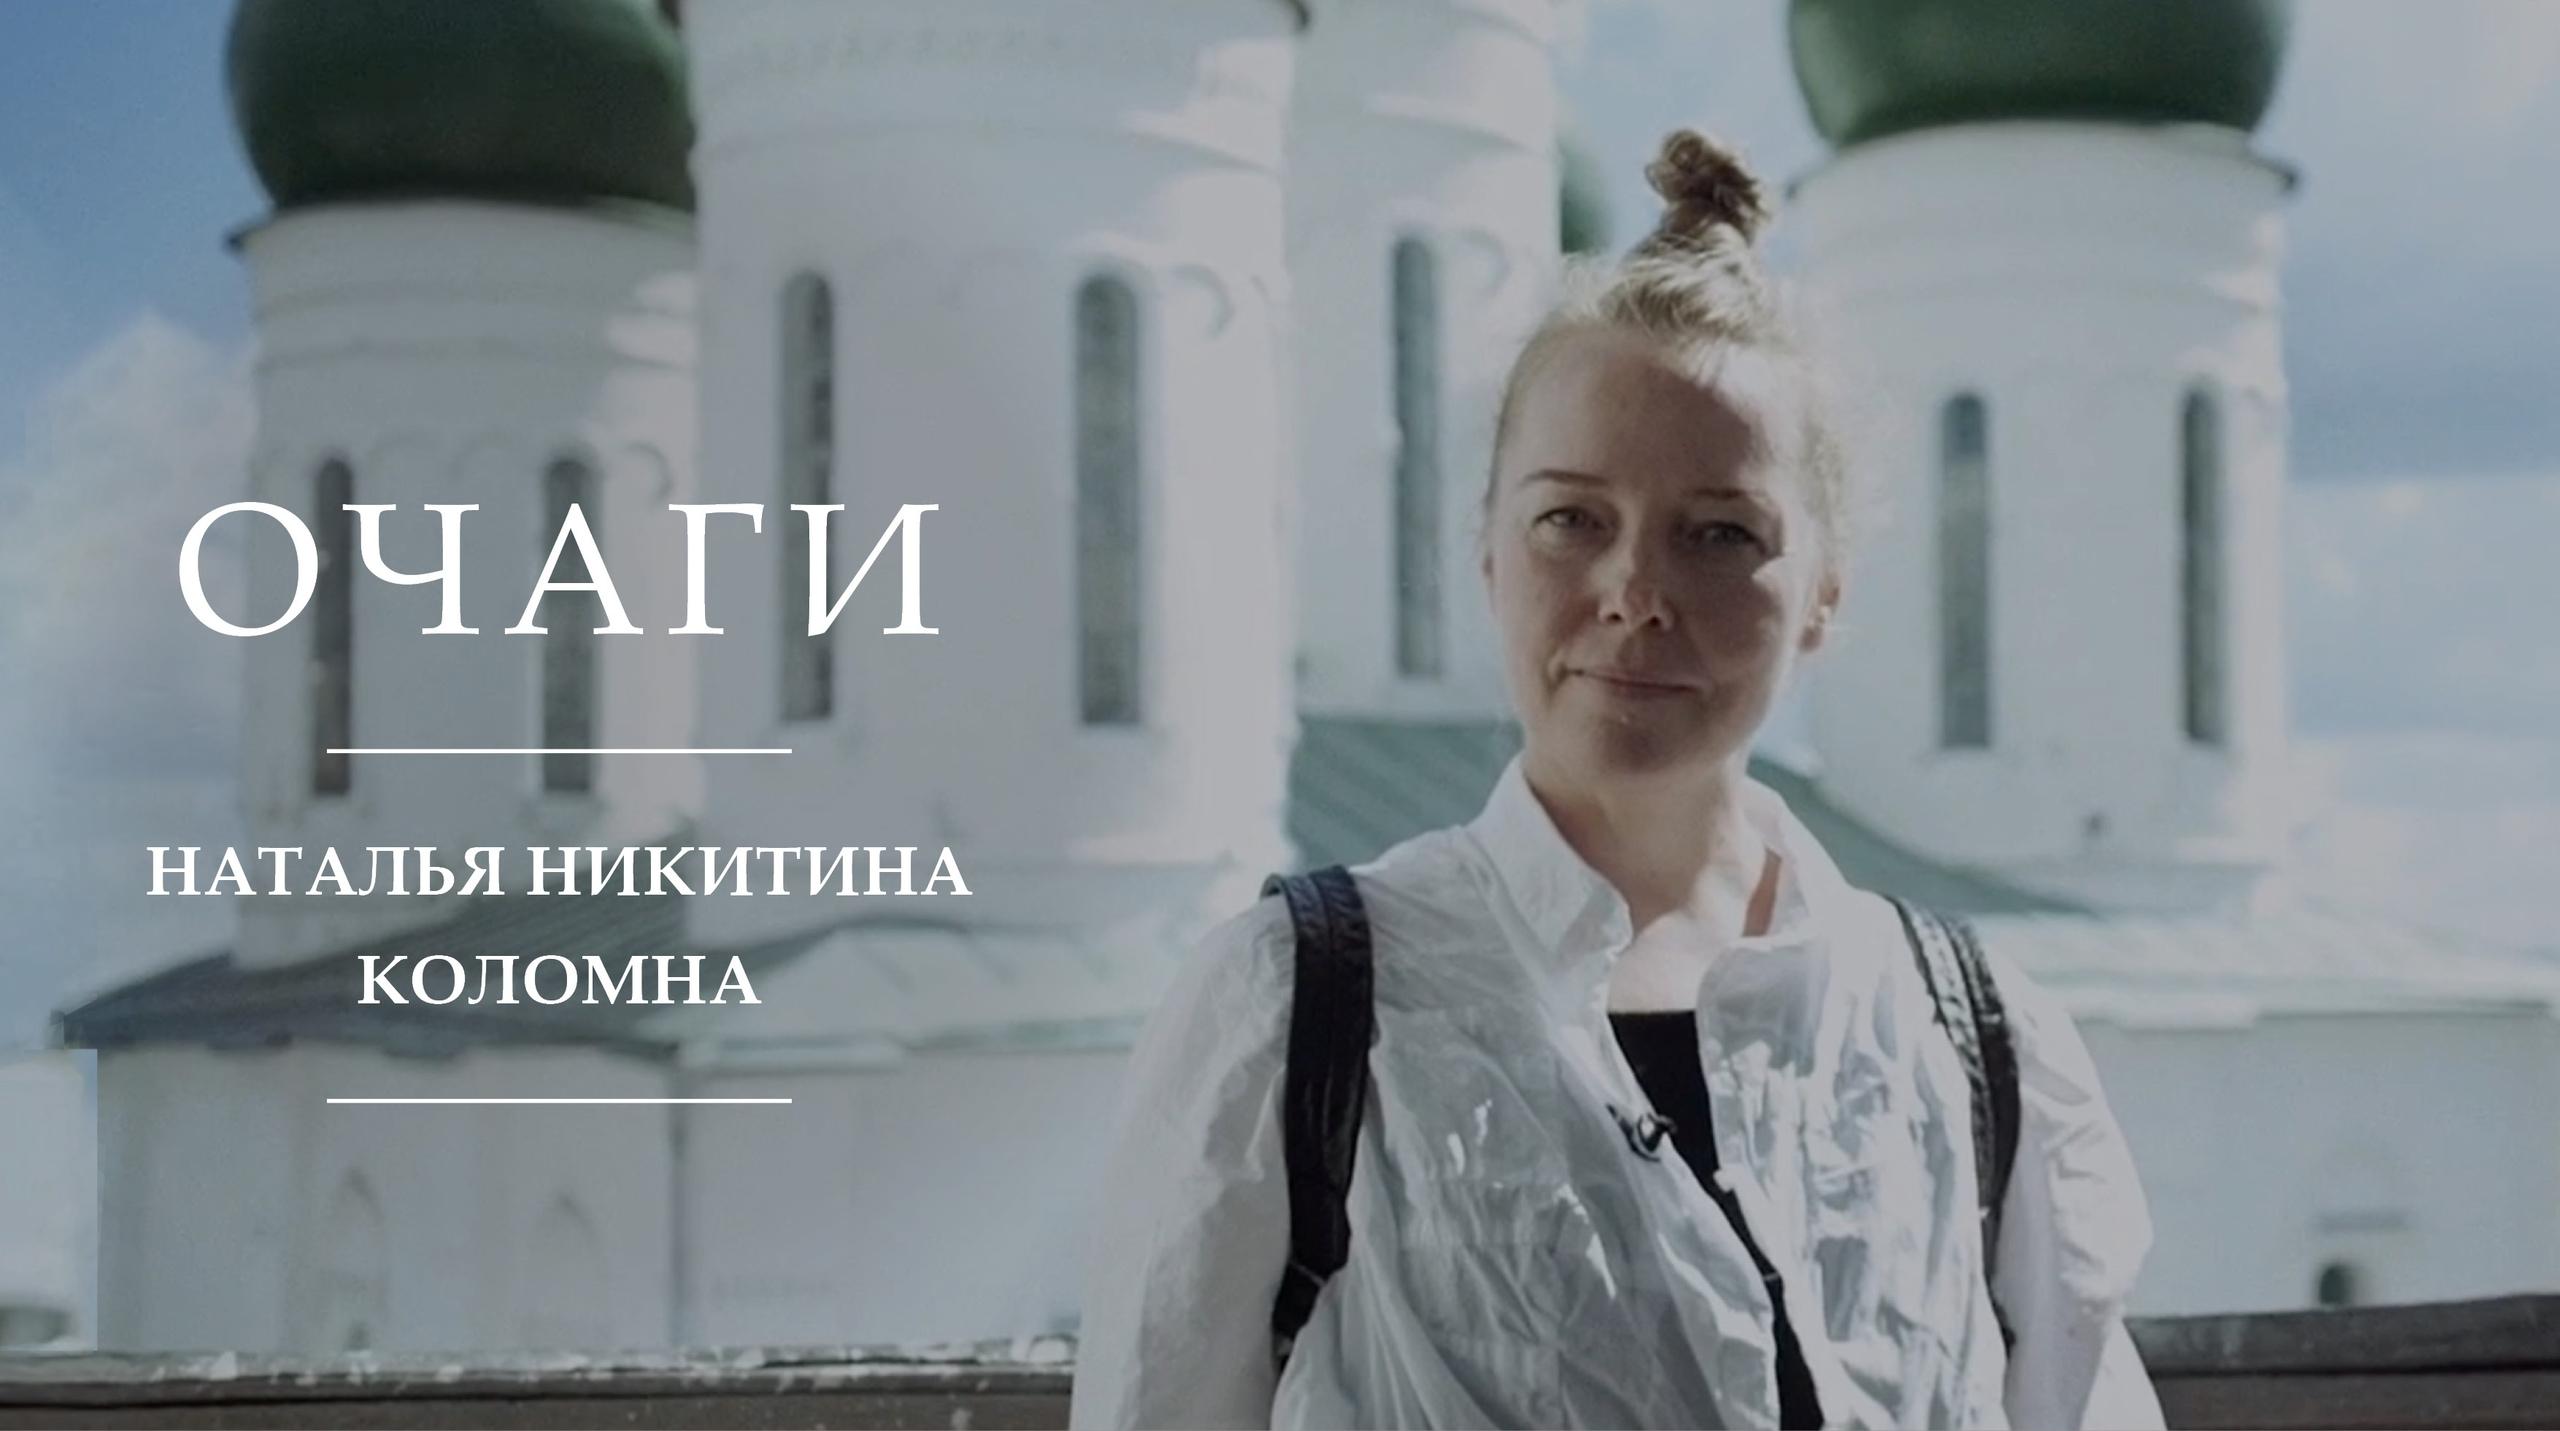 Очаги | Наталья Никитина | Коломна